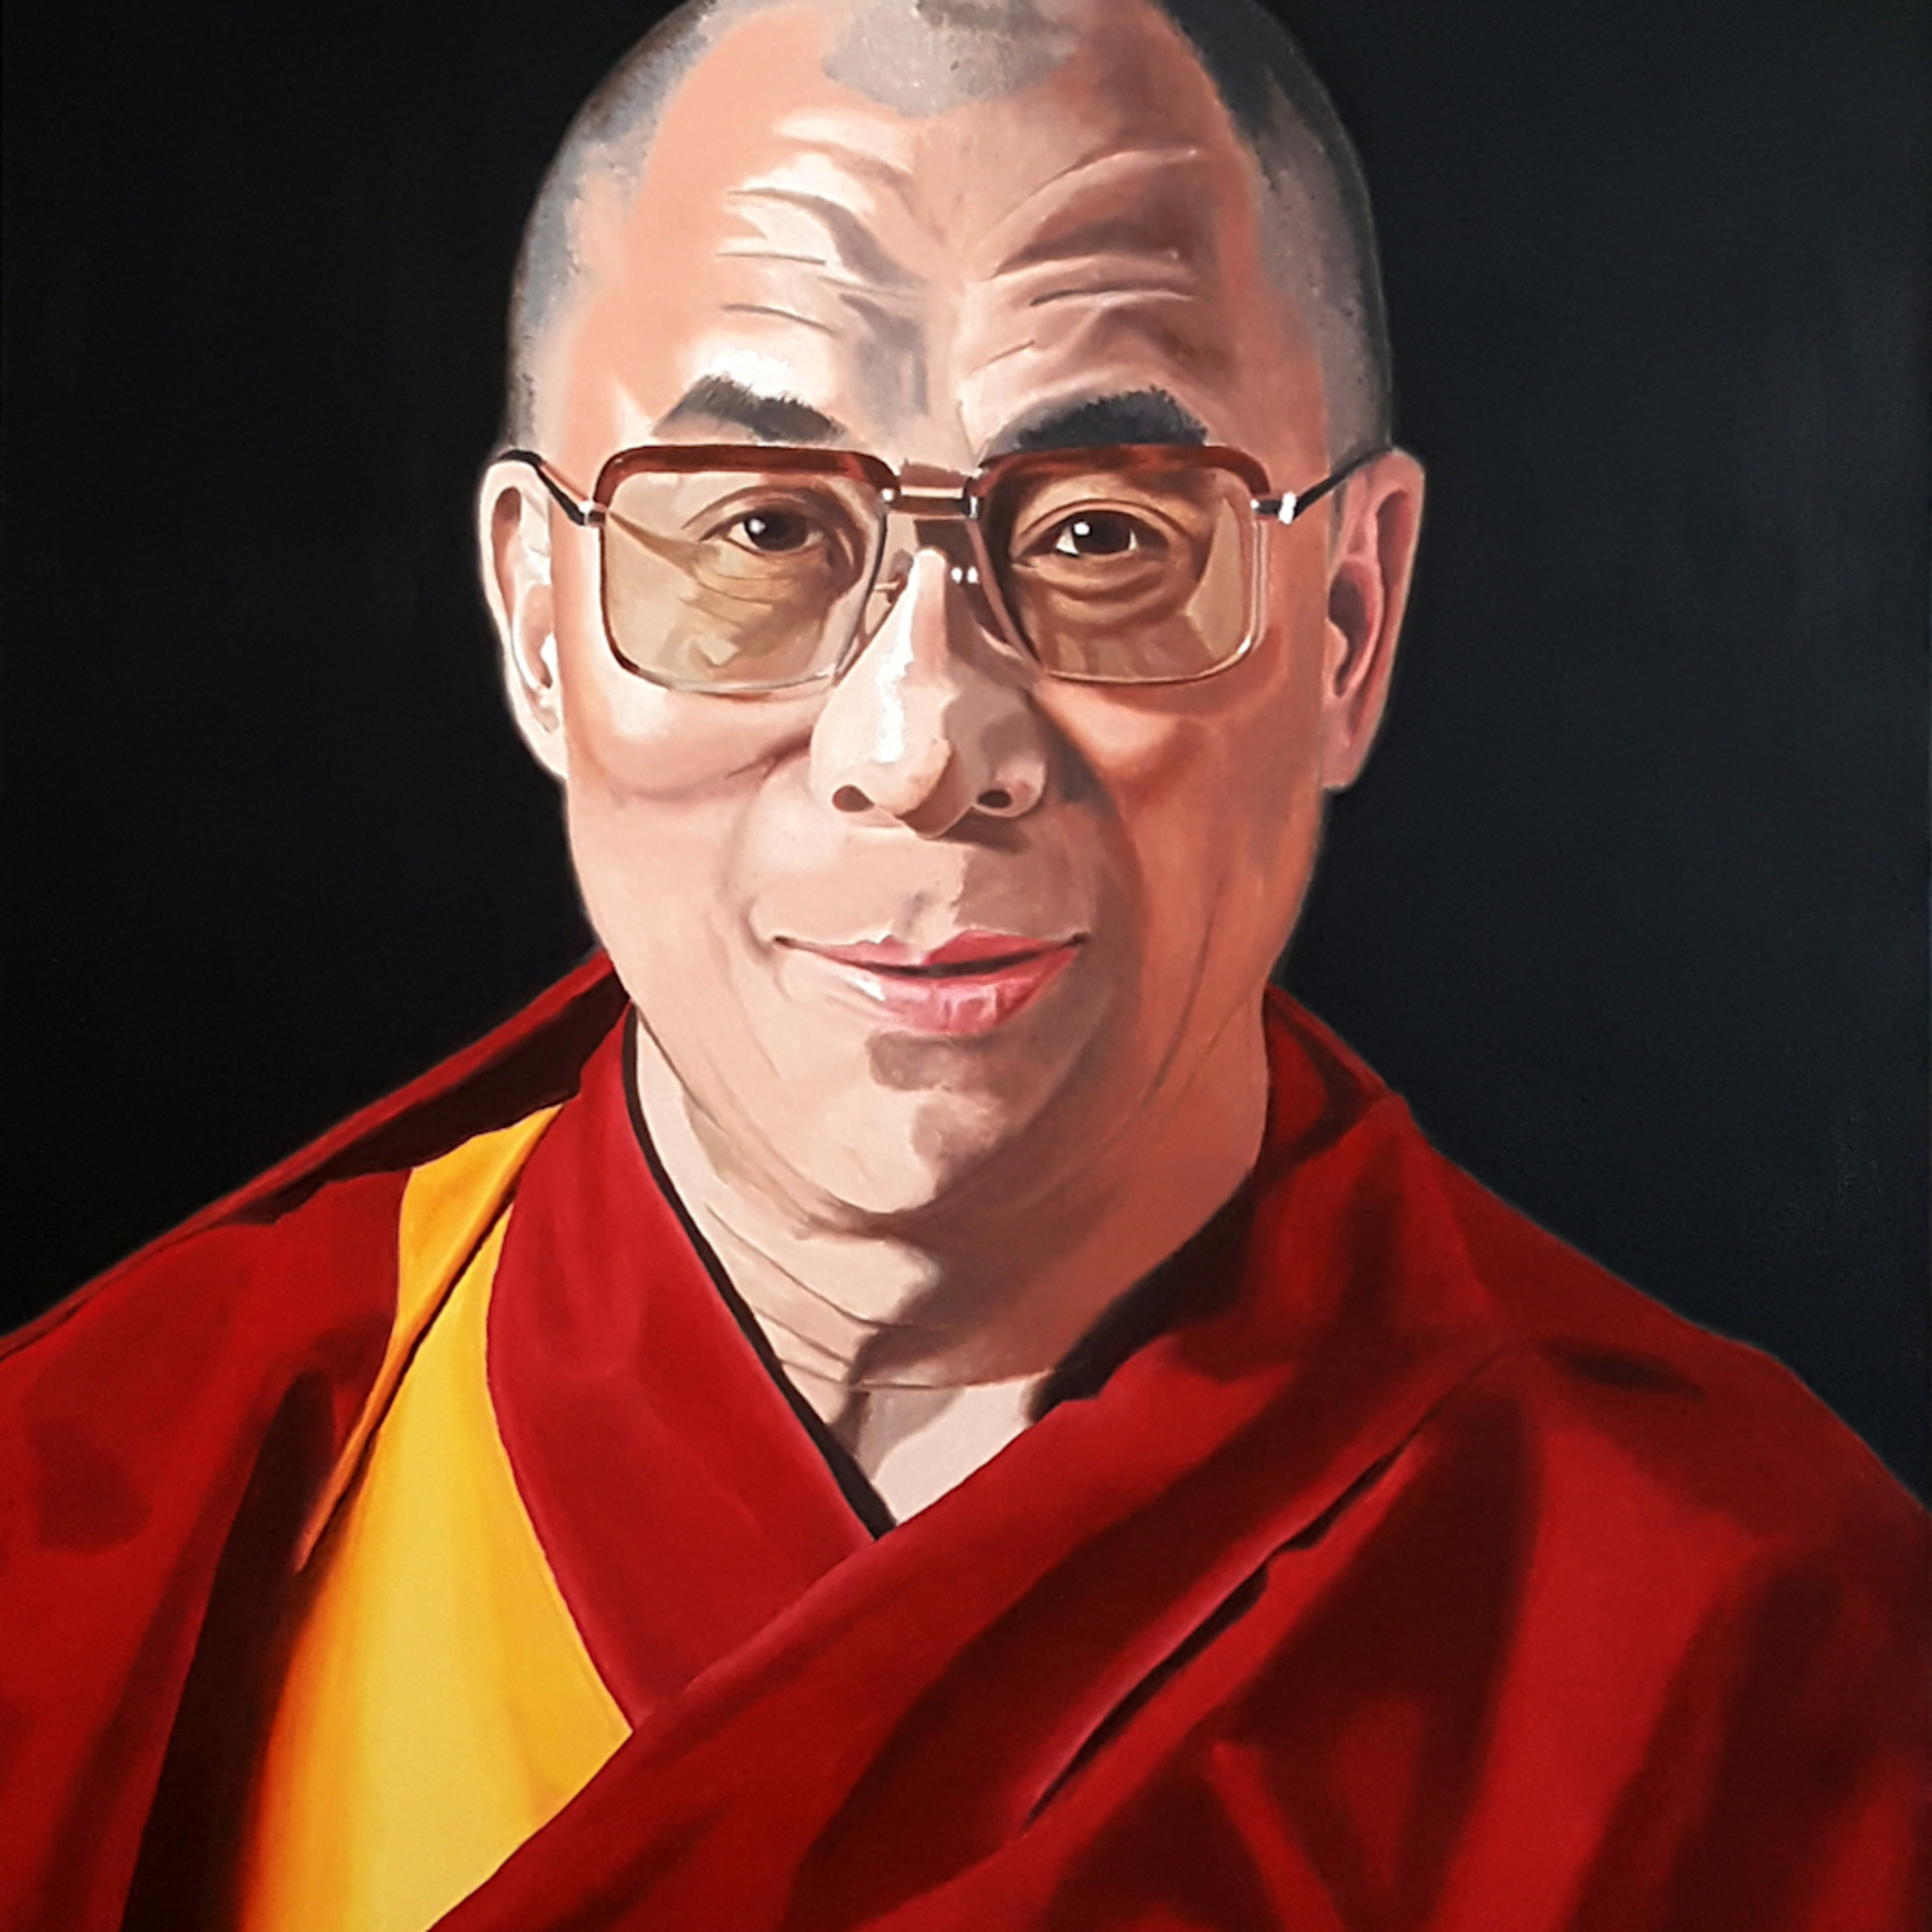 Hh 14th dalai lama ethxqy